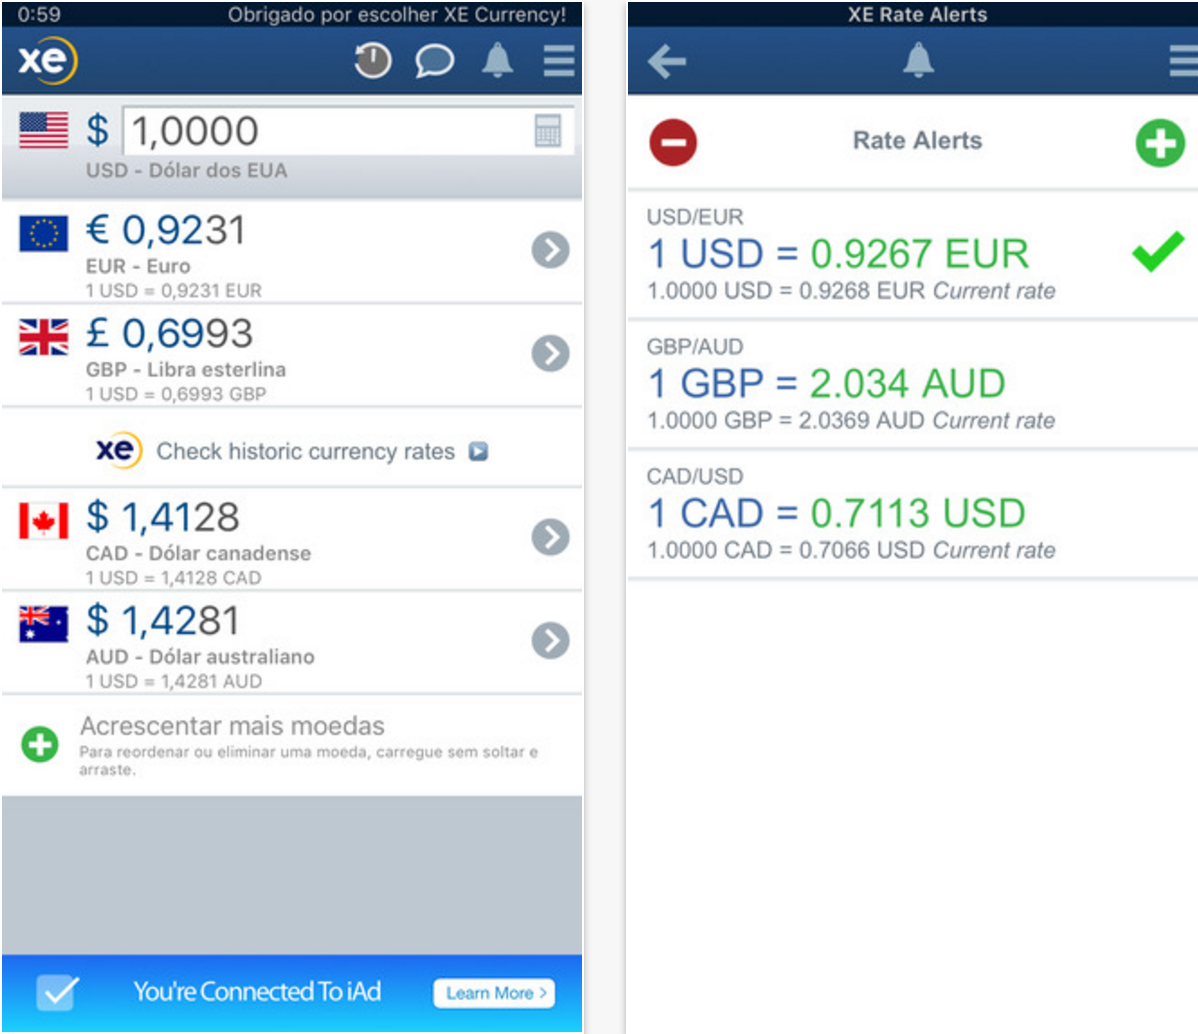 Aplicativo para converter para a moeda local